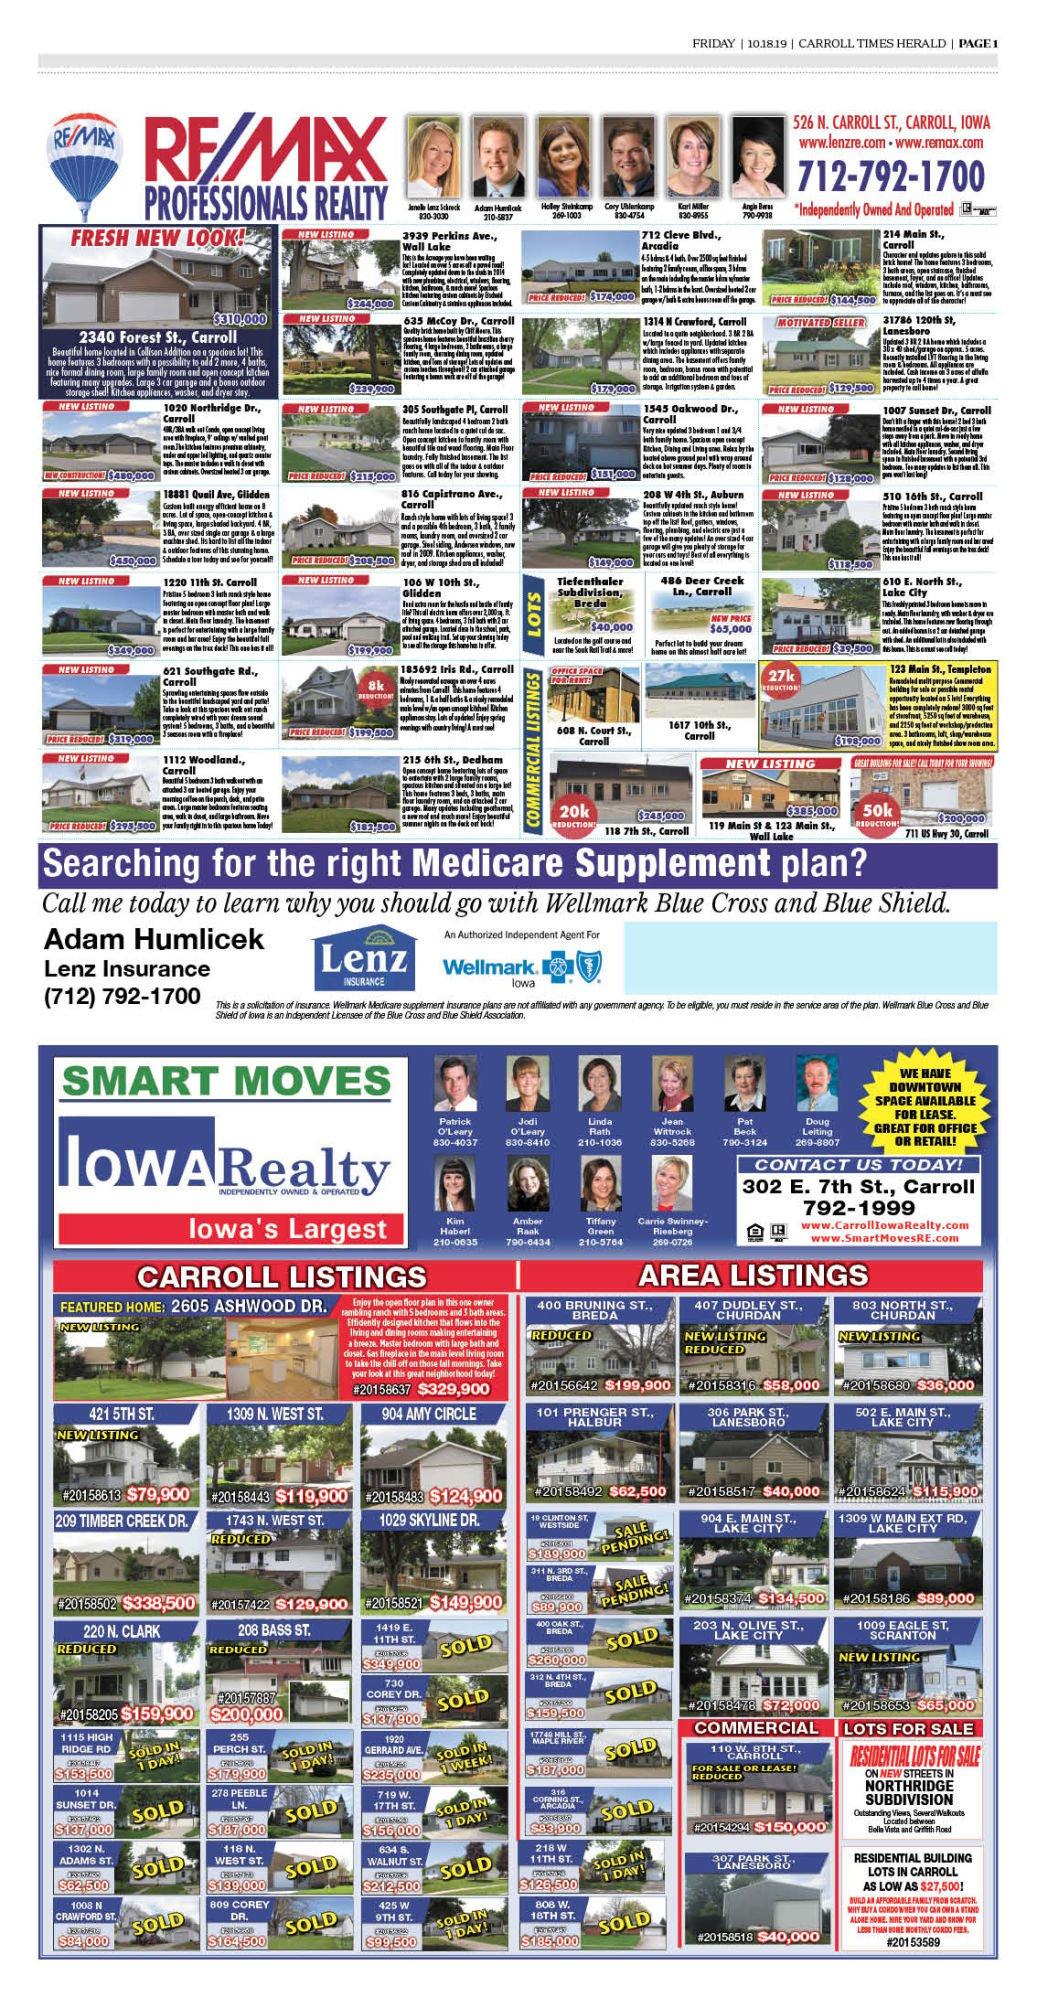 10-18-19 Real Estate1.jpg